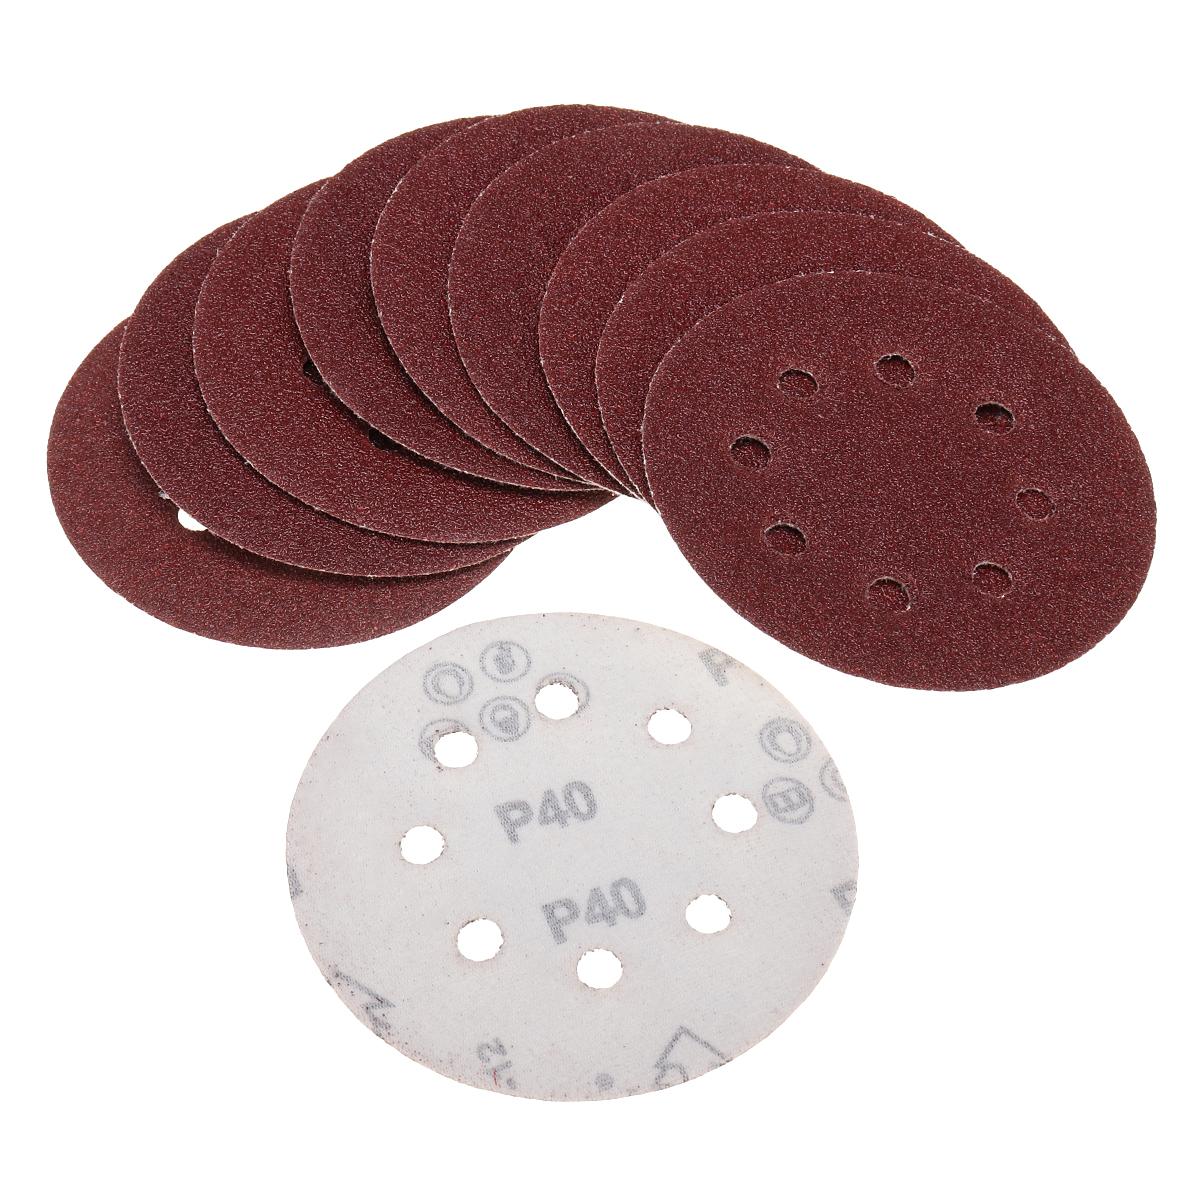 Rhino sanding discs wheel positioning jacks